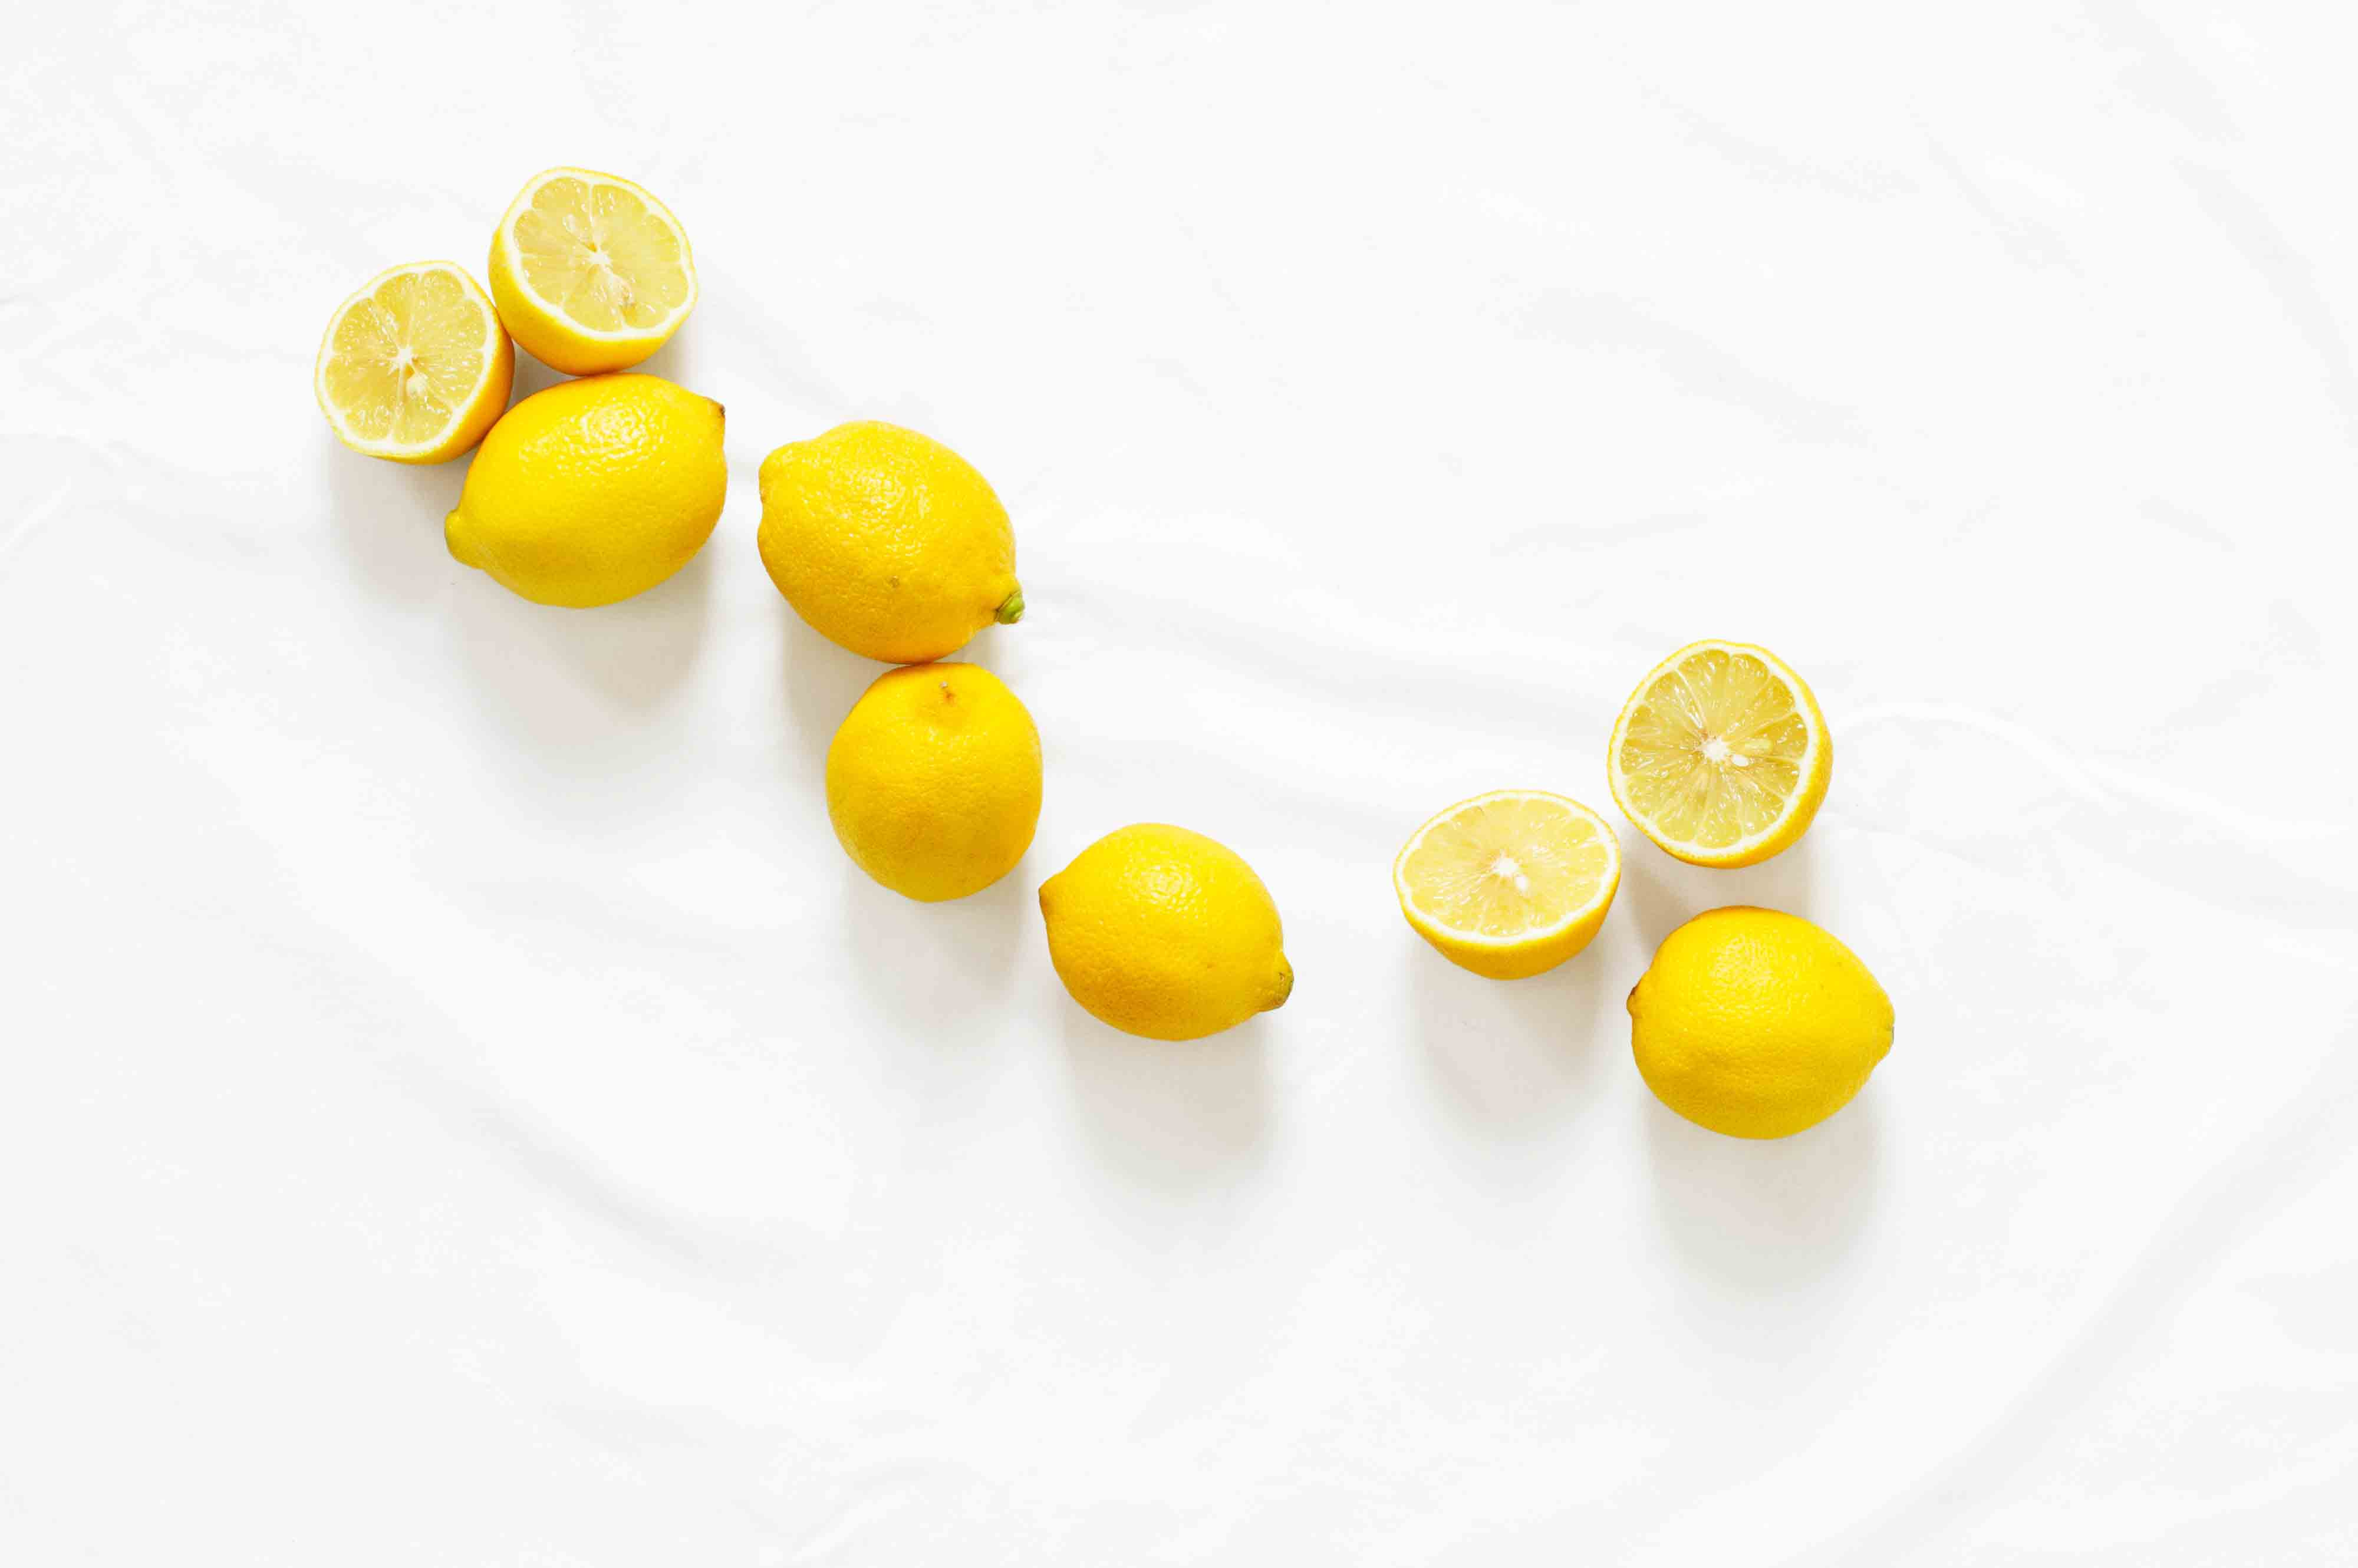 lemon hacks, home hacks, home organization, home and living, home essentials, organizing home, organized home, kitchen hacks, kitchen tools, uses of lemon at home